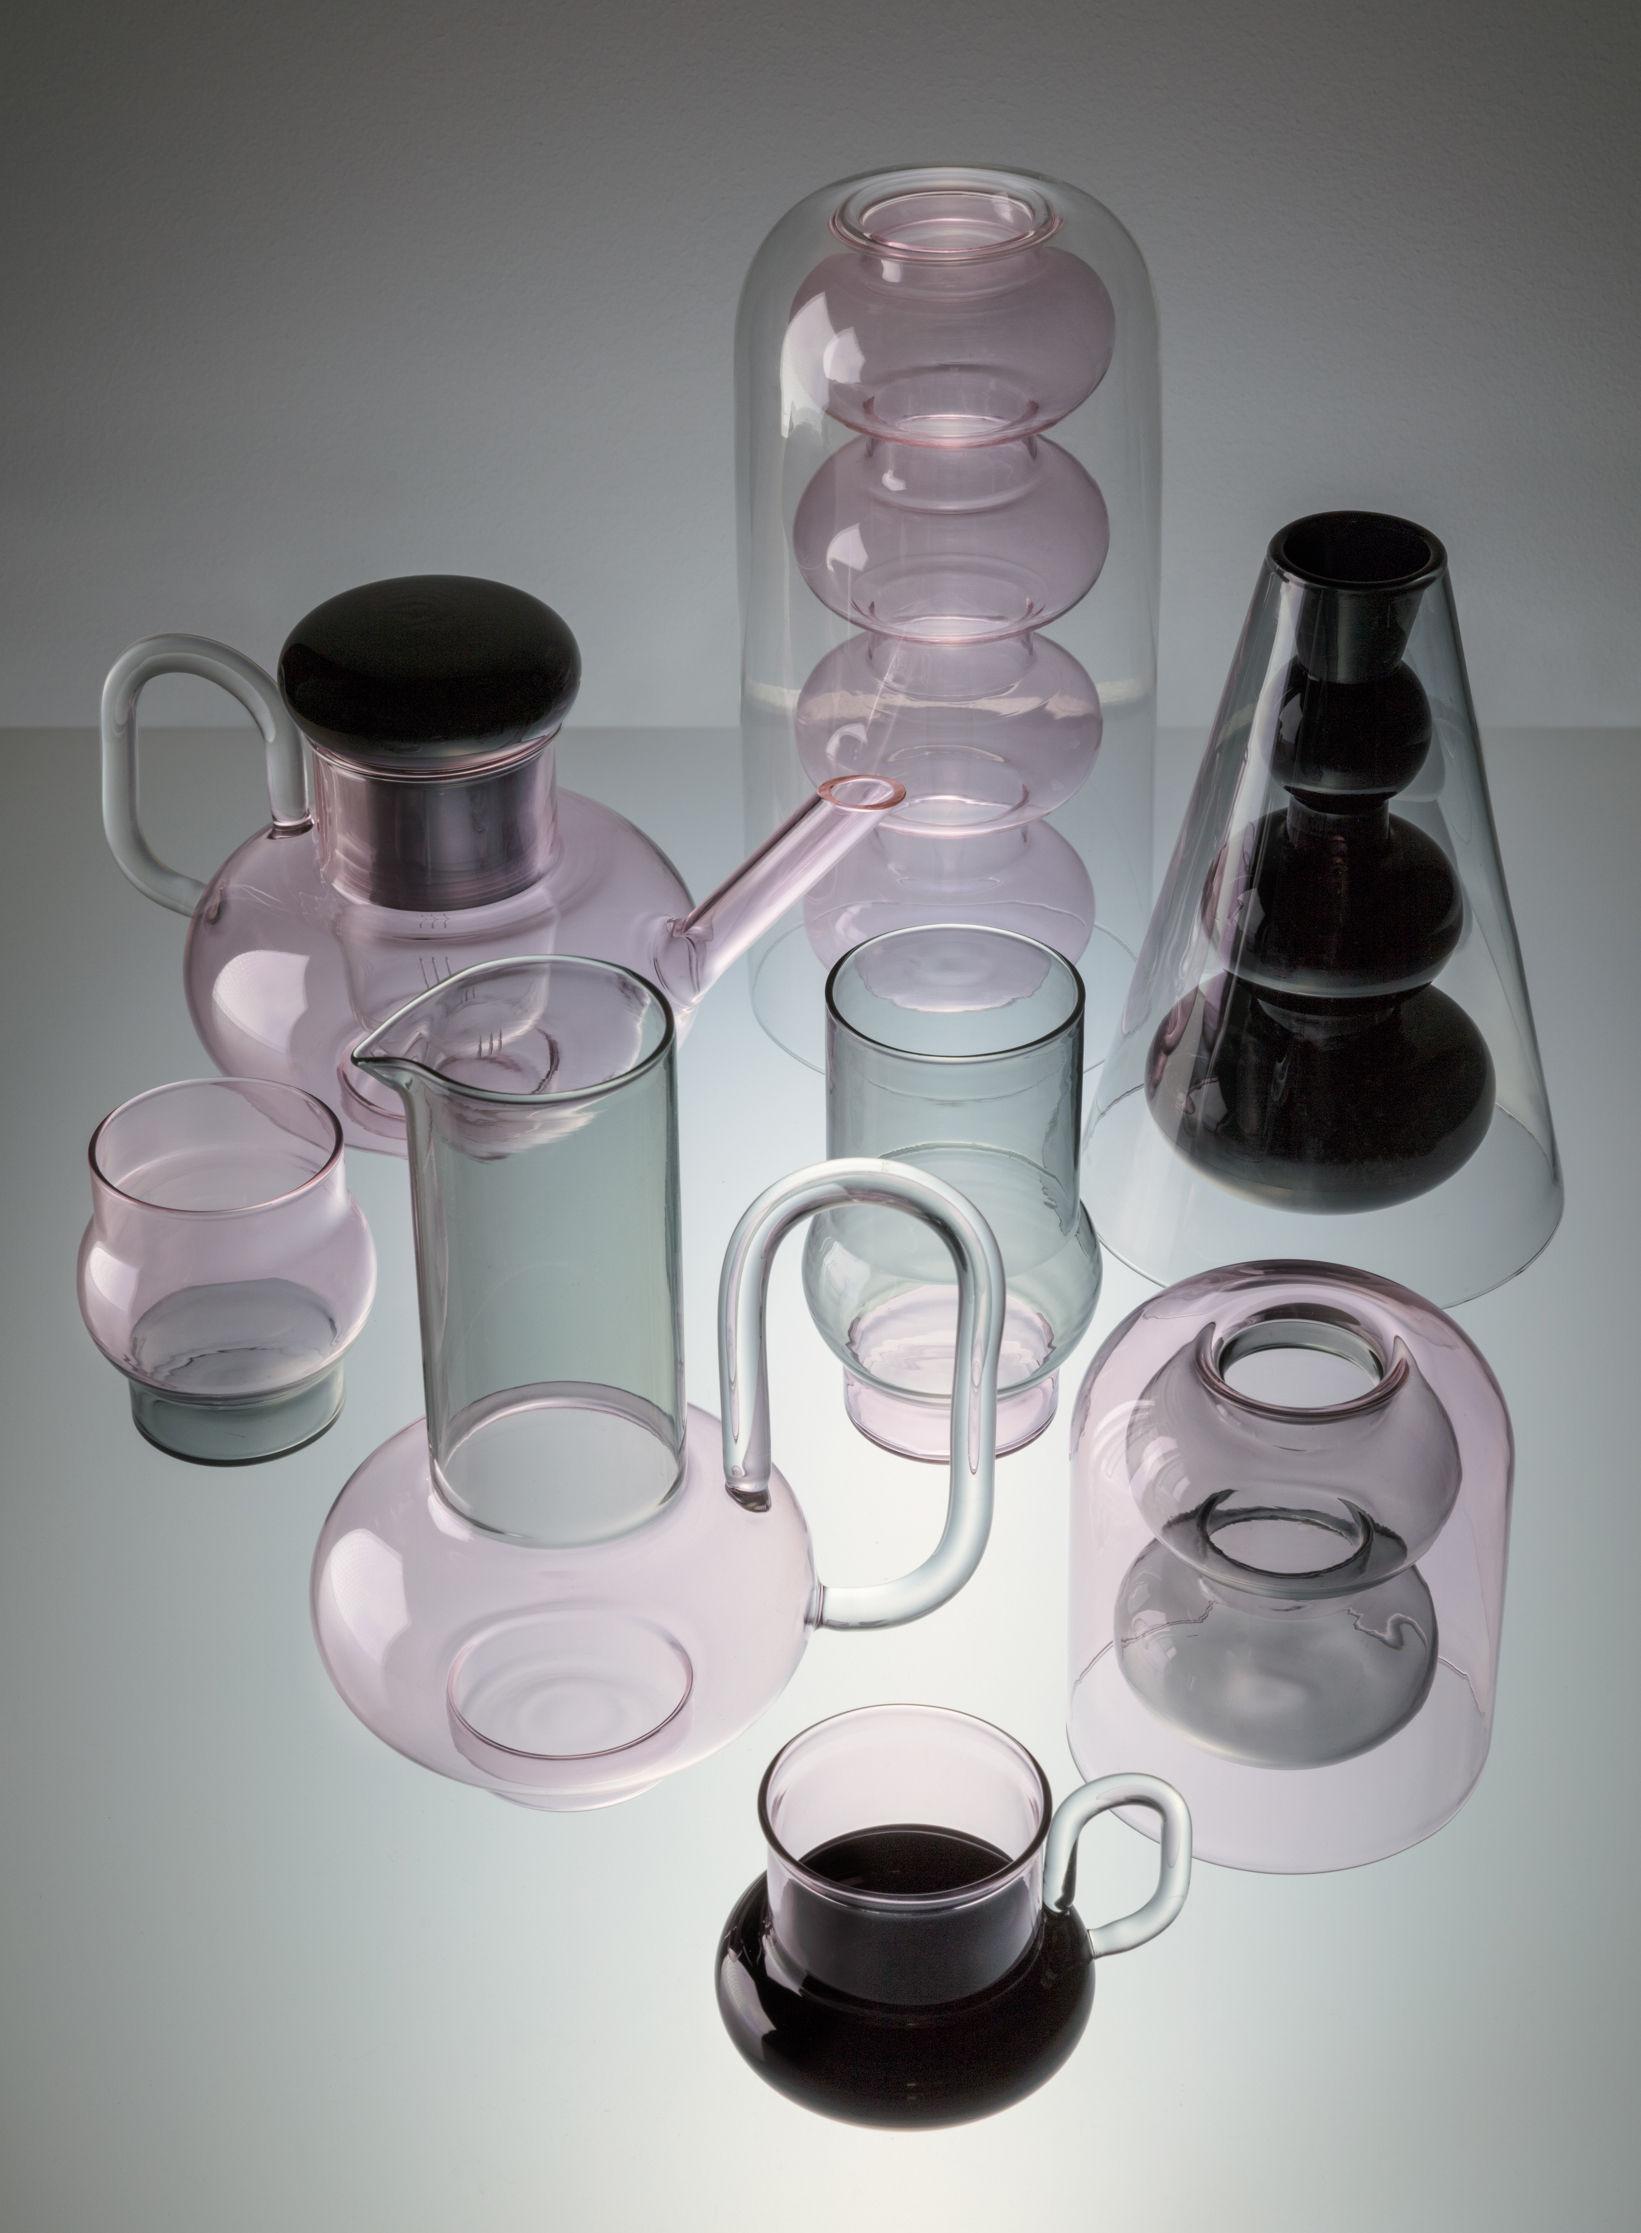 carafe bump verre souffl gris rose tom dixon made in design. Black Bedroom Furniture Sets. Home Design Ideas